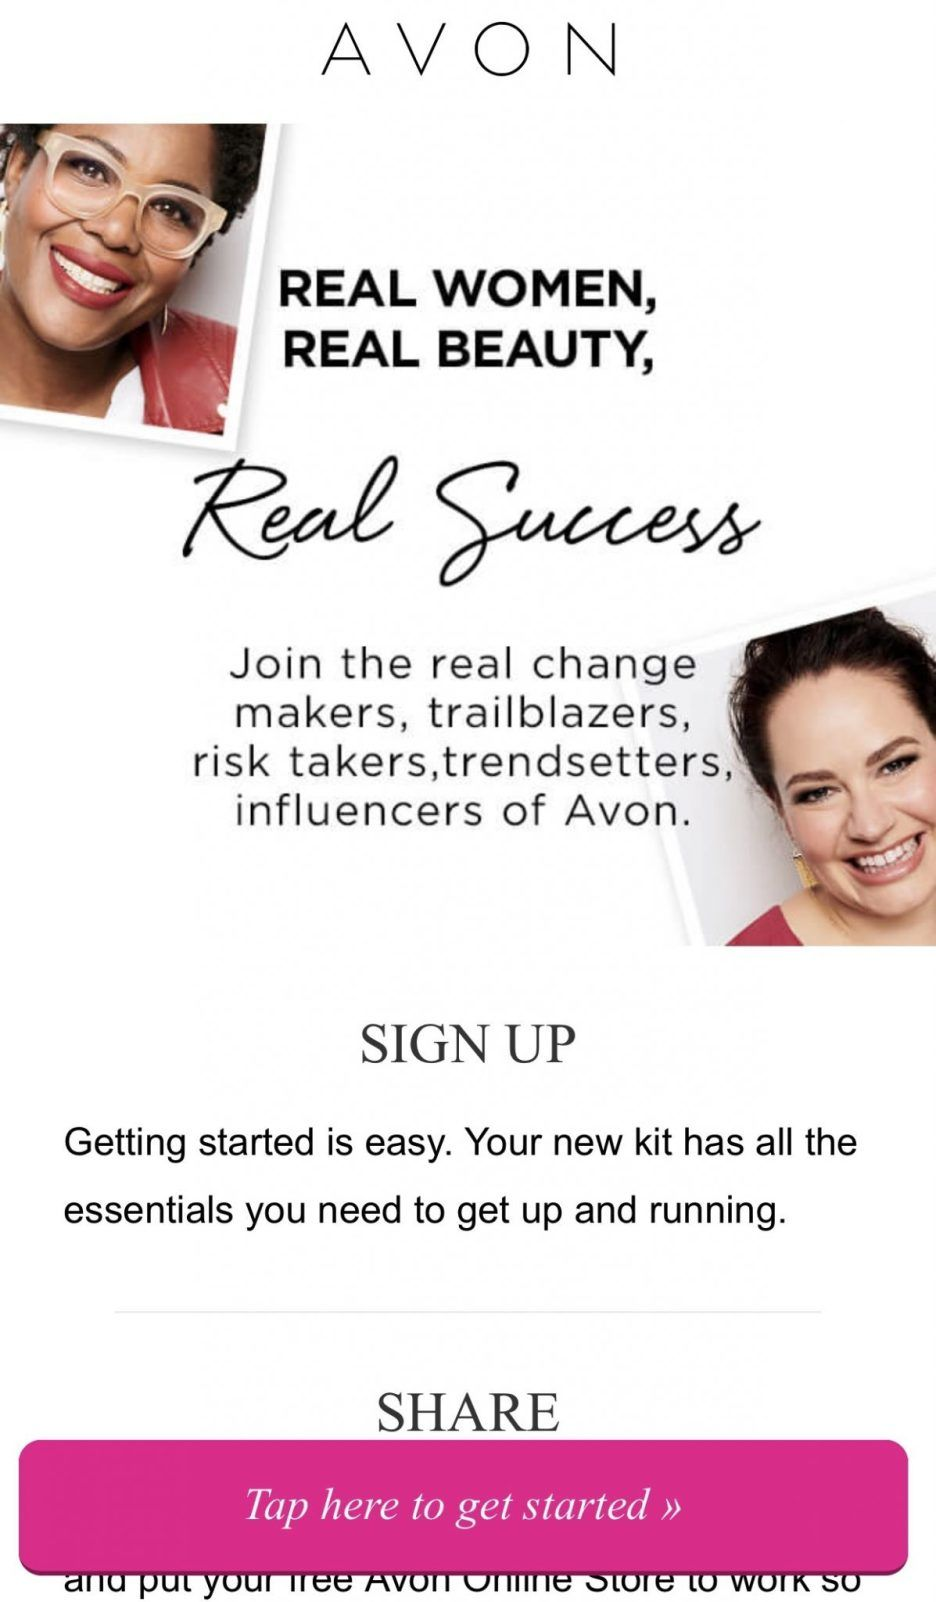 7 Ways To Start Avon For Free Sell avon online, Avon